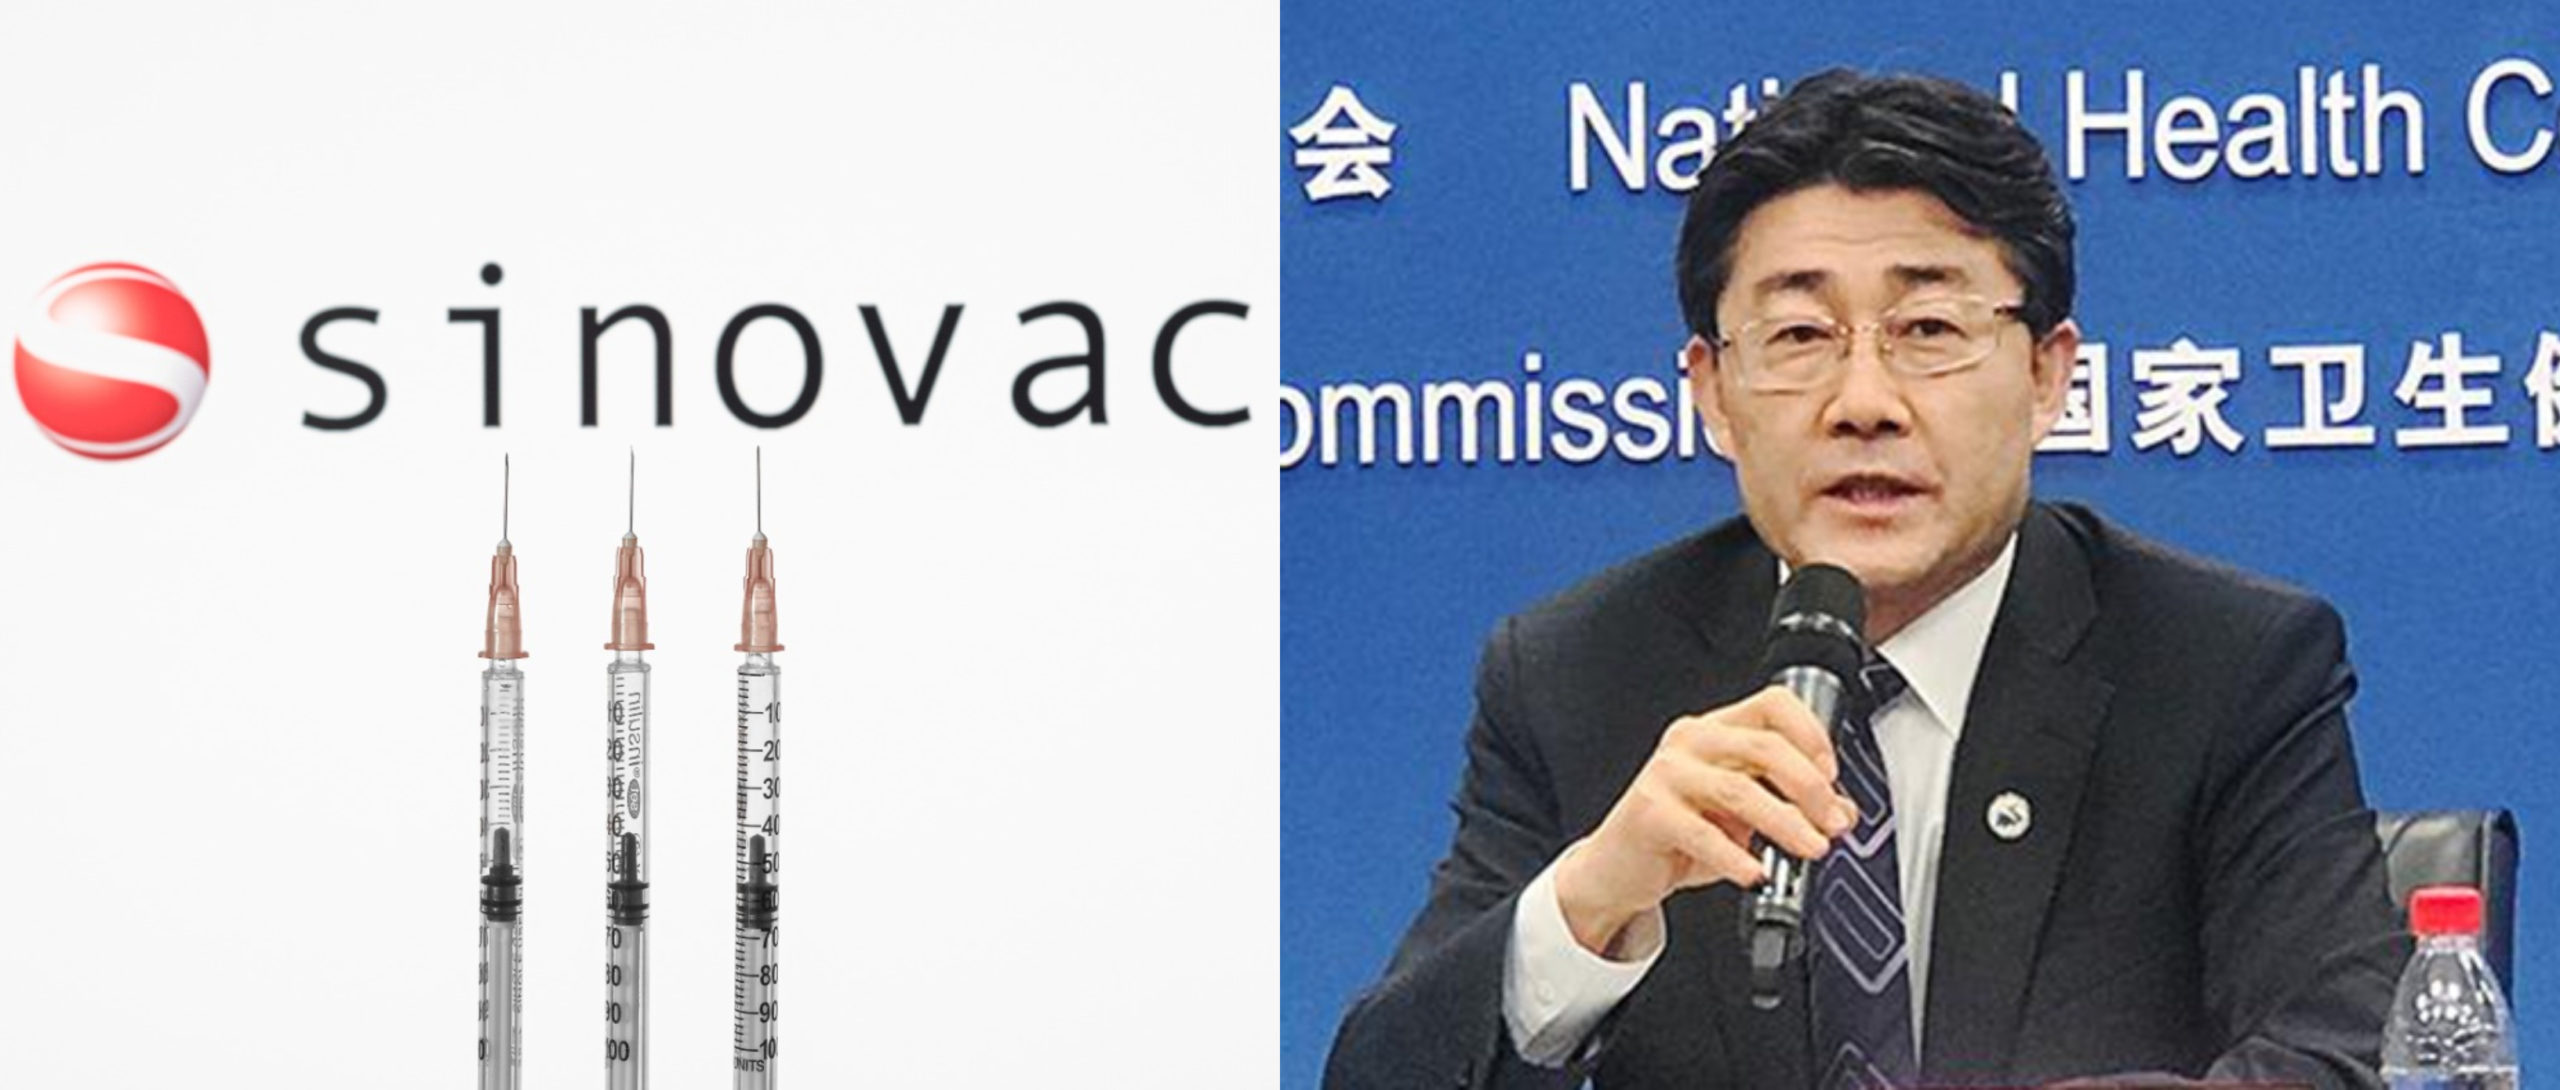 eficacia-Gao-Fu-Sinovac-vacunas